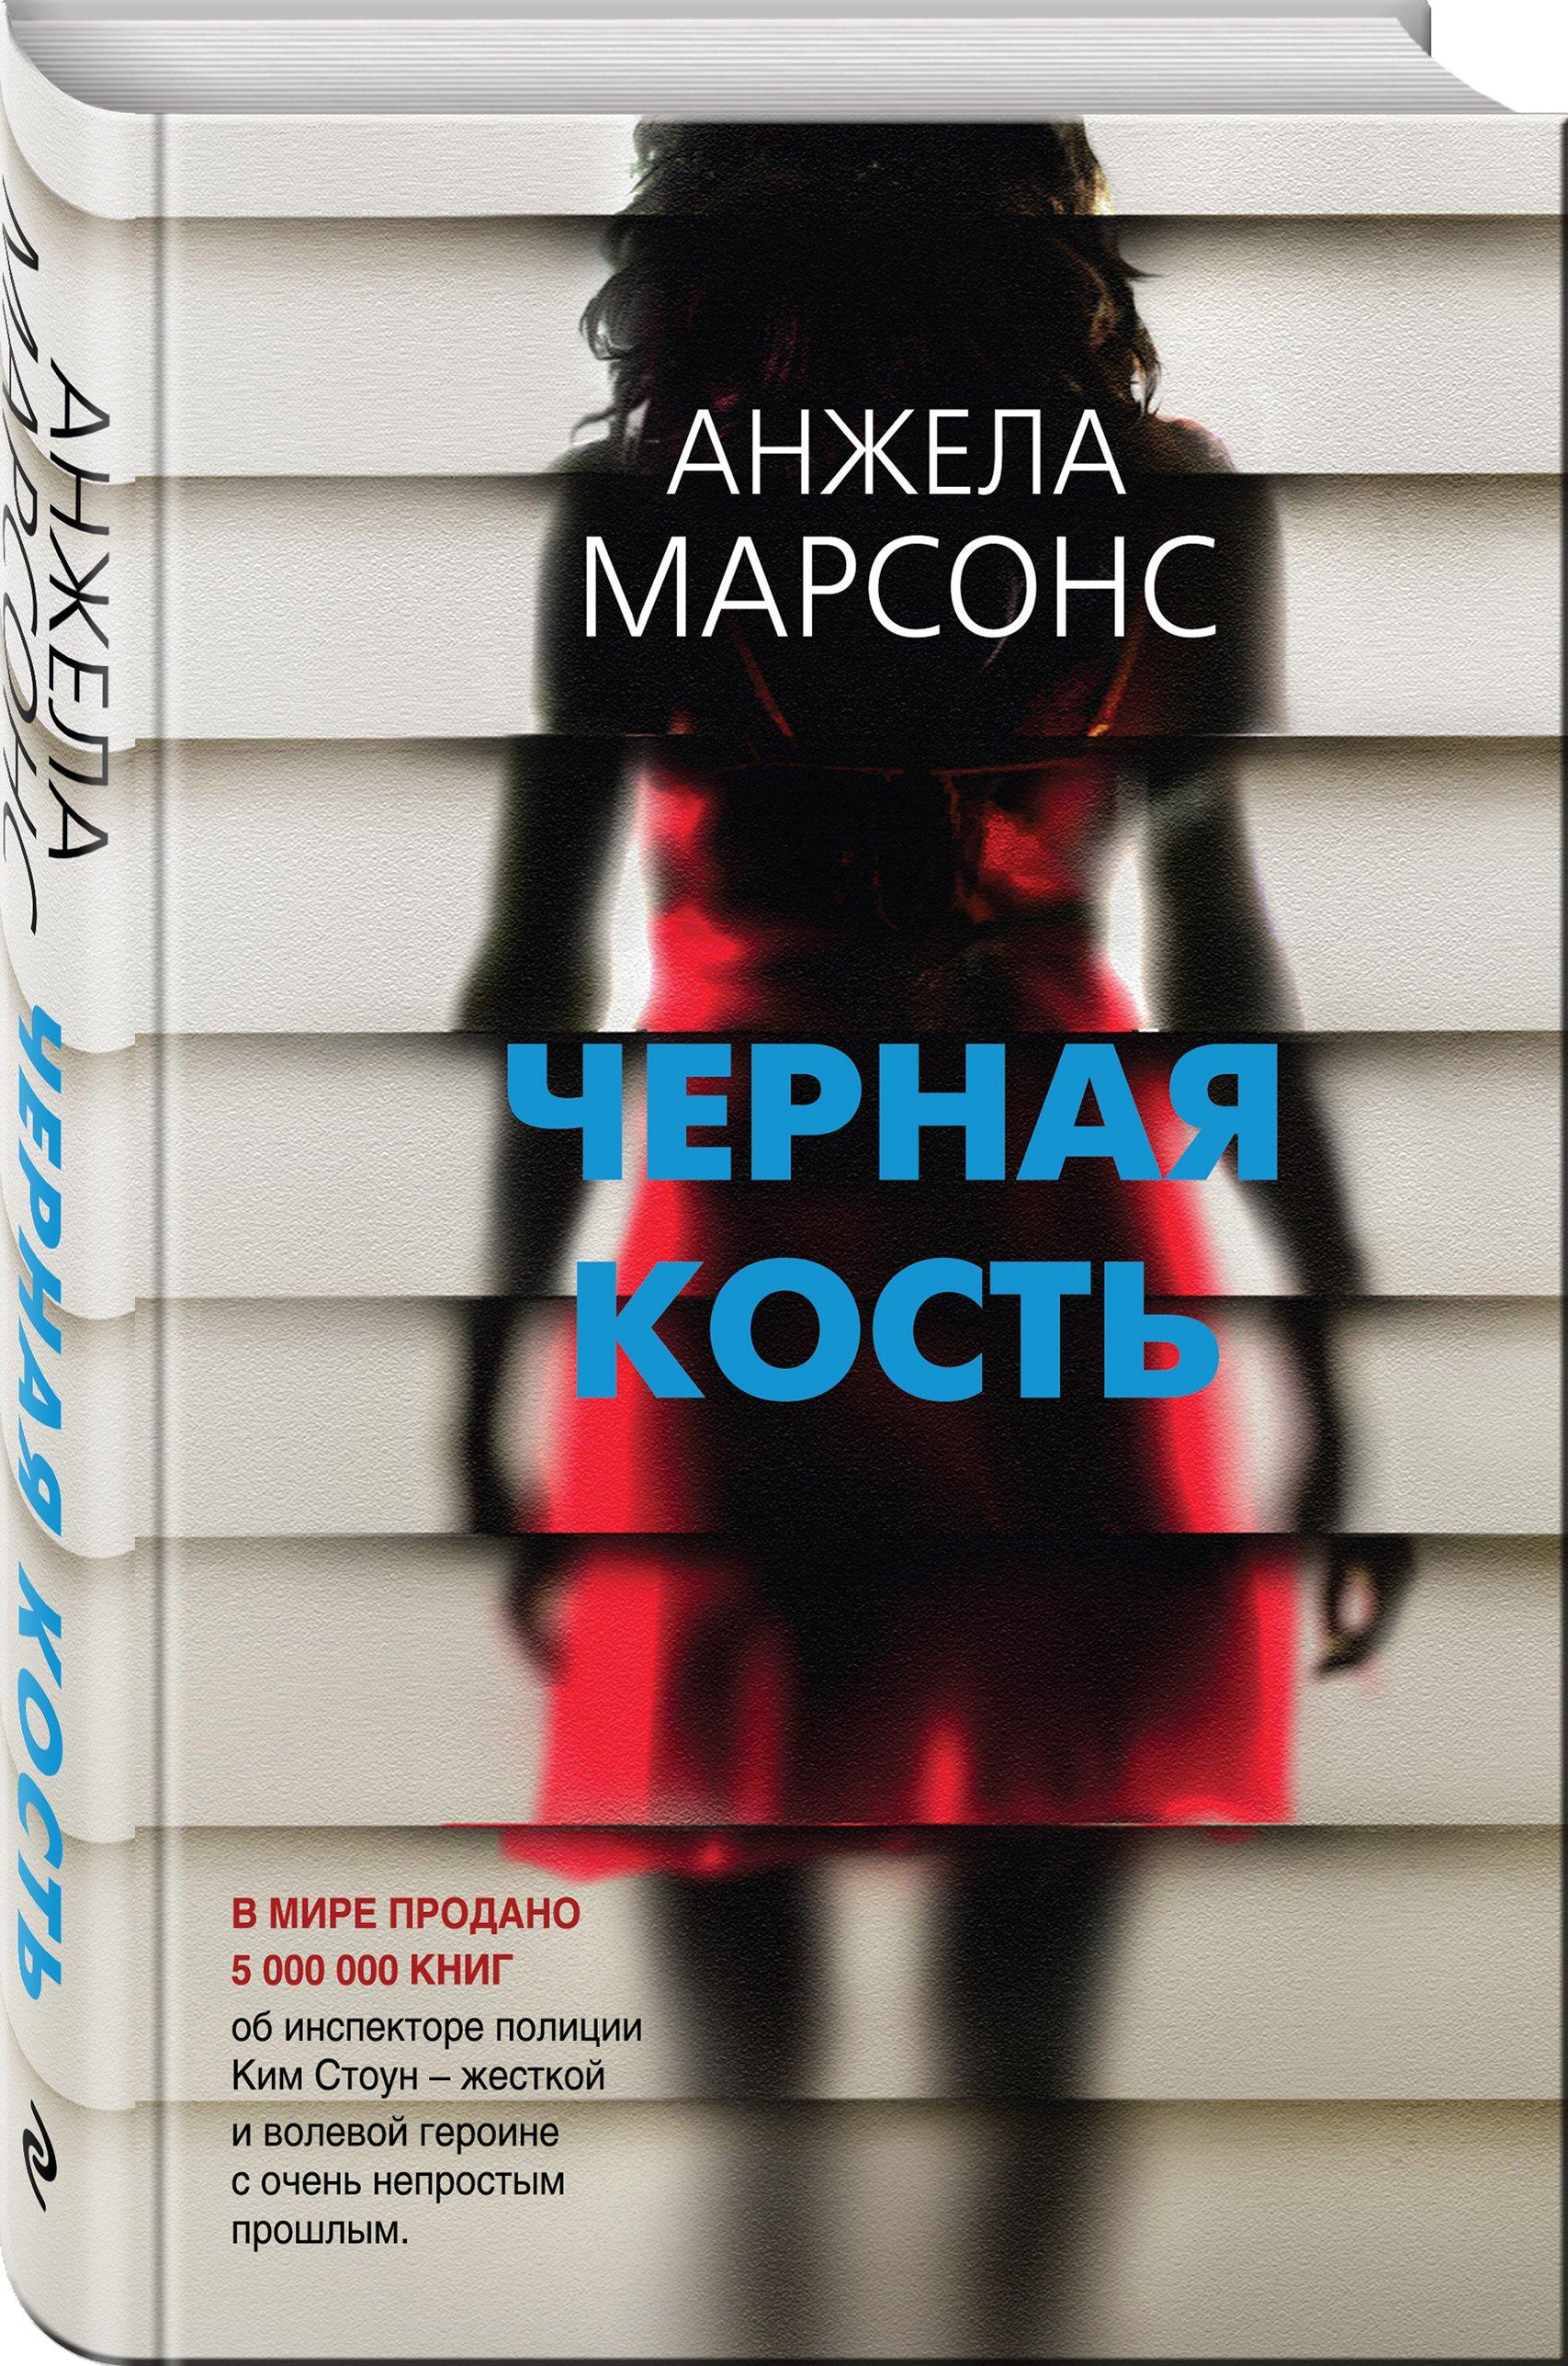 Zakazat.ru: Черная кость. Марсонс Анжела